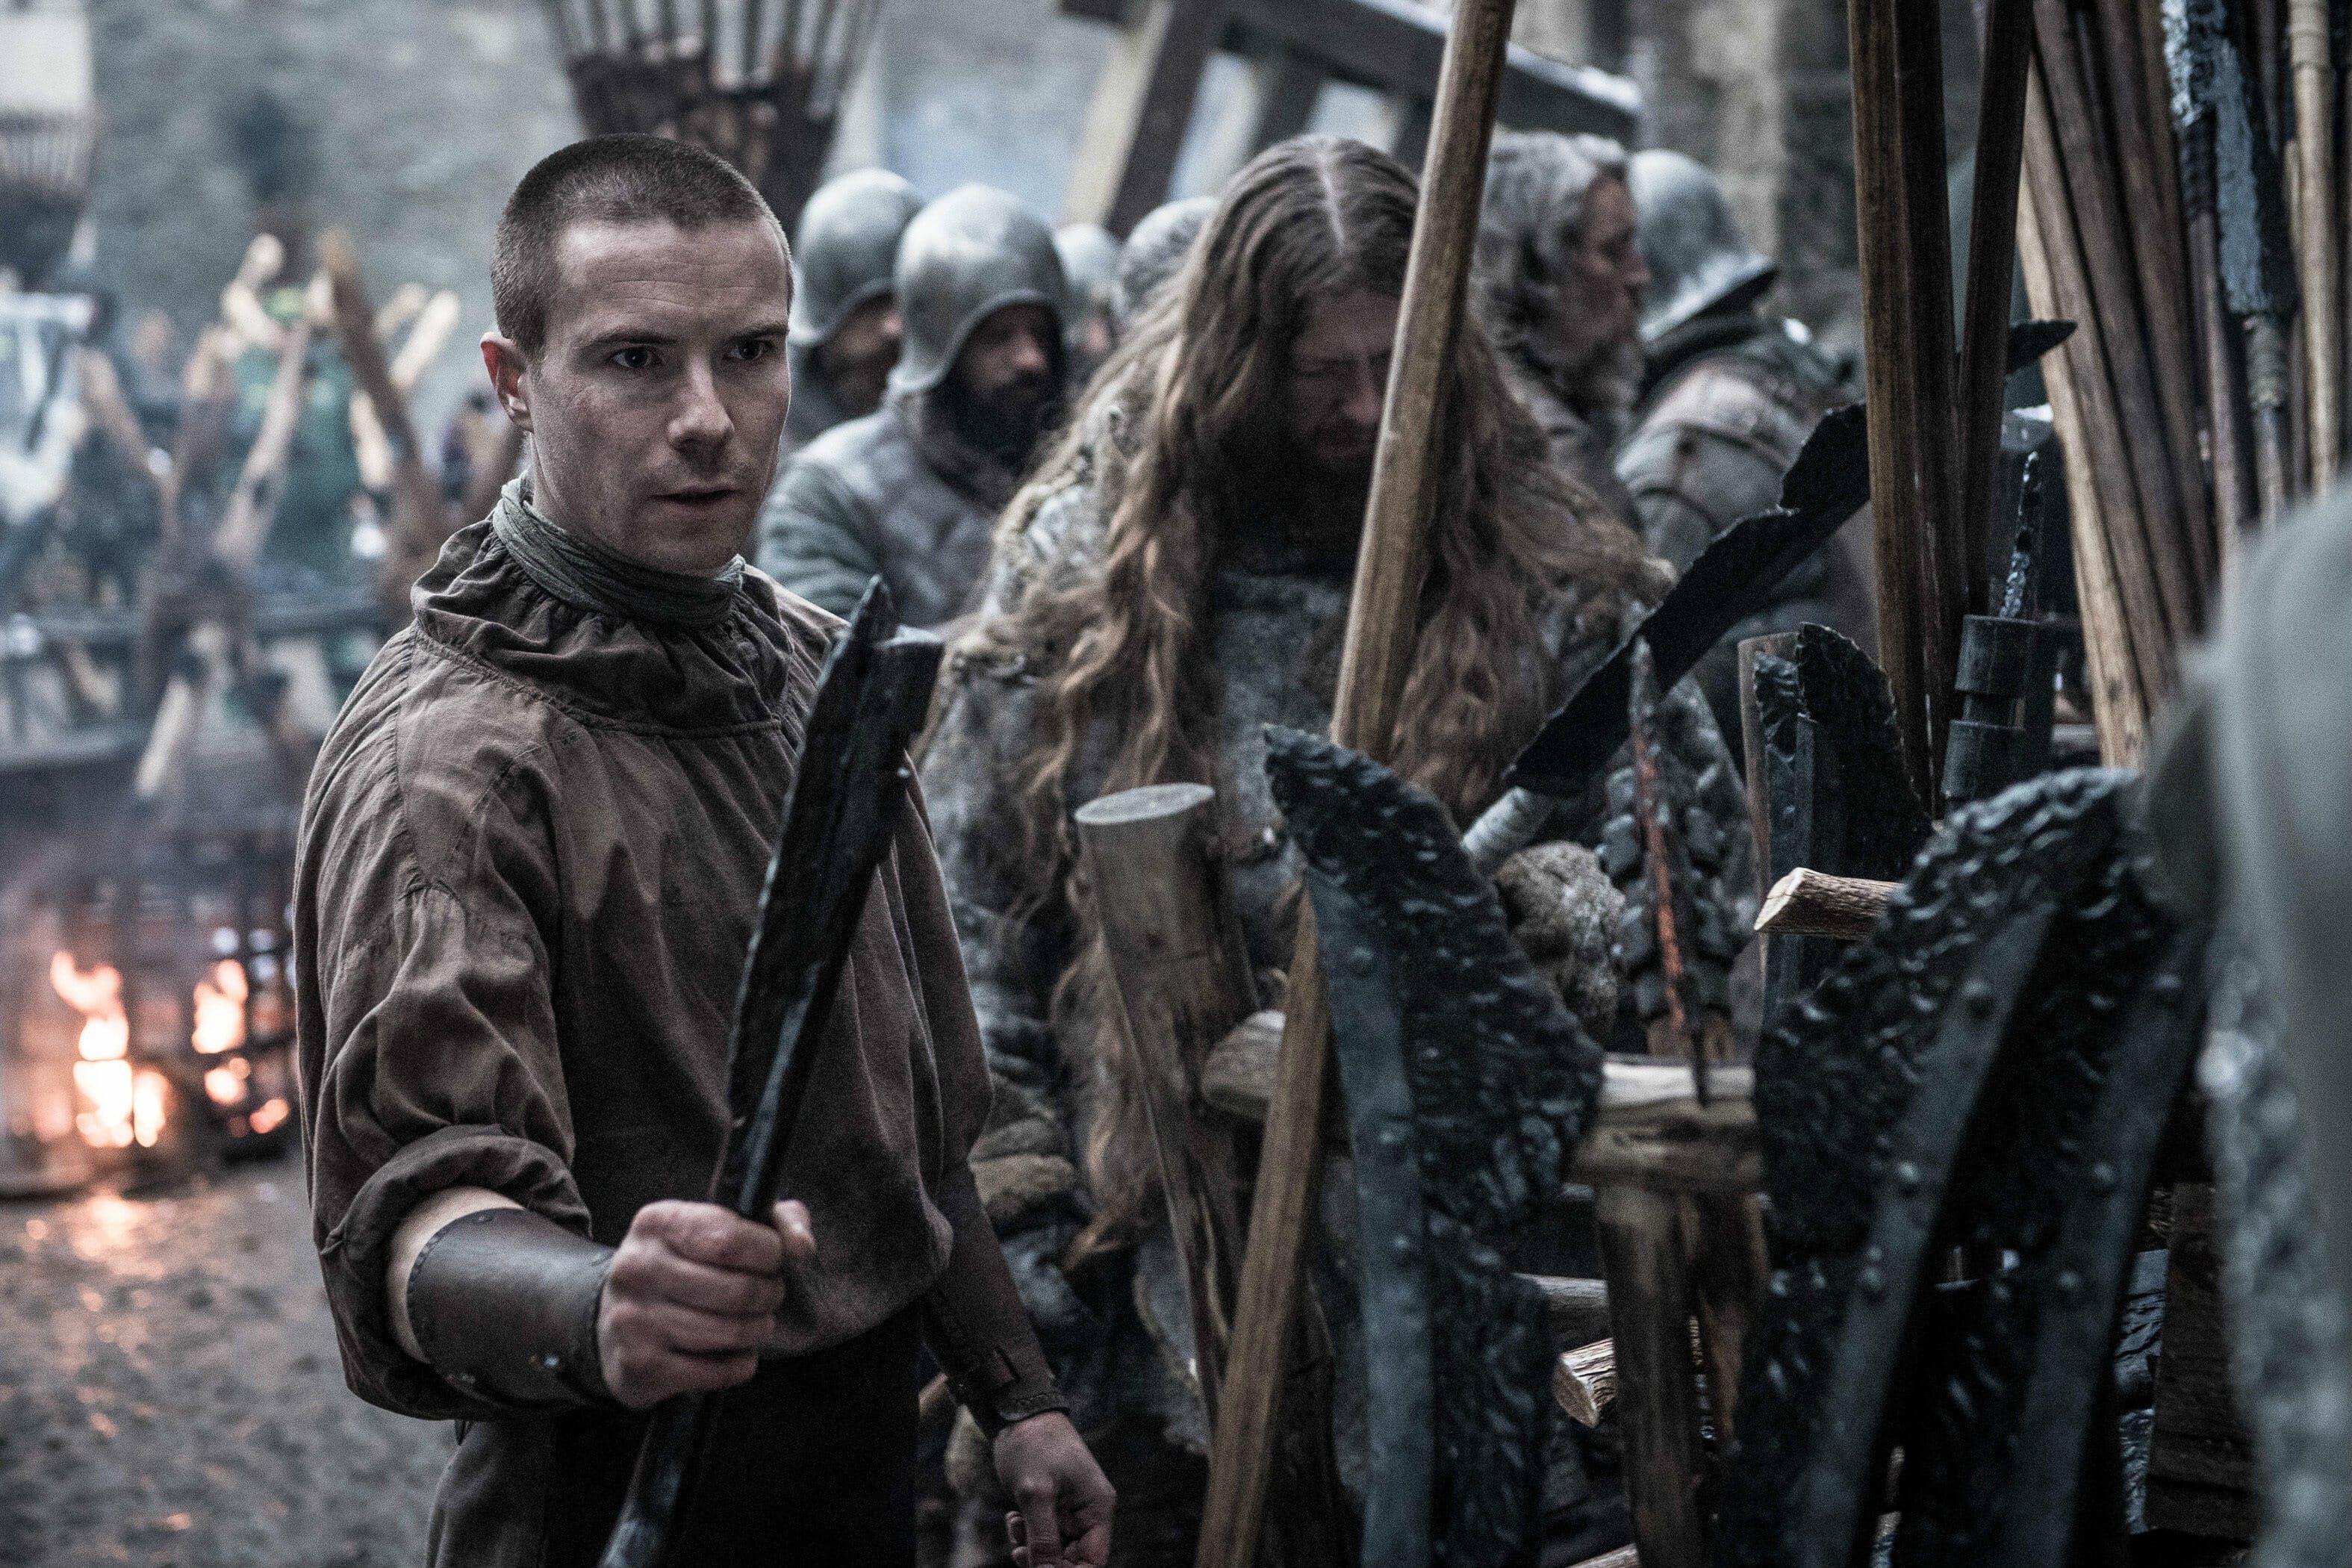 Game of Thrones armies - Stormlands Gendry Baratheon